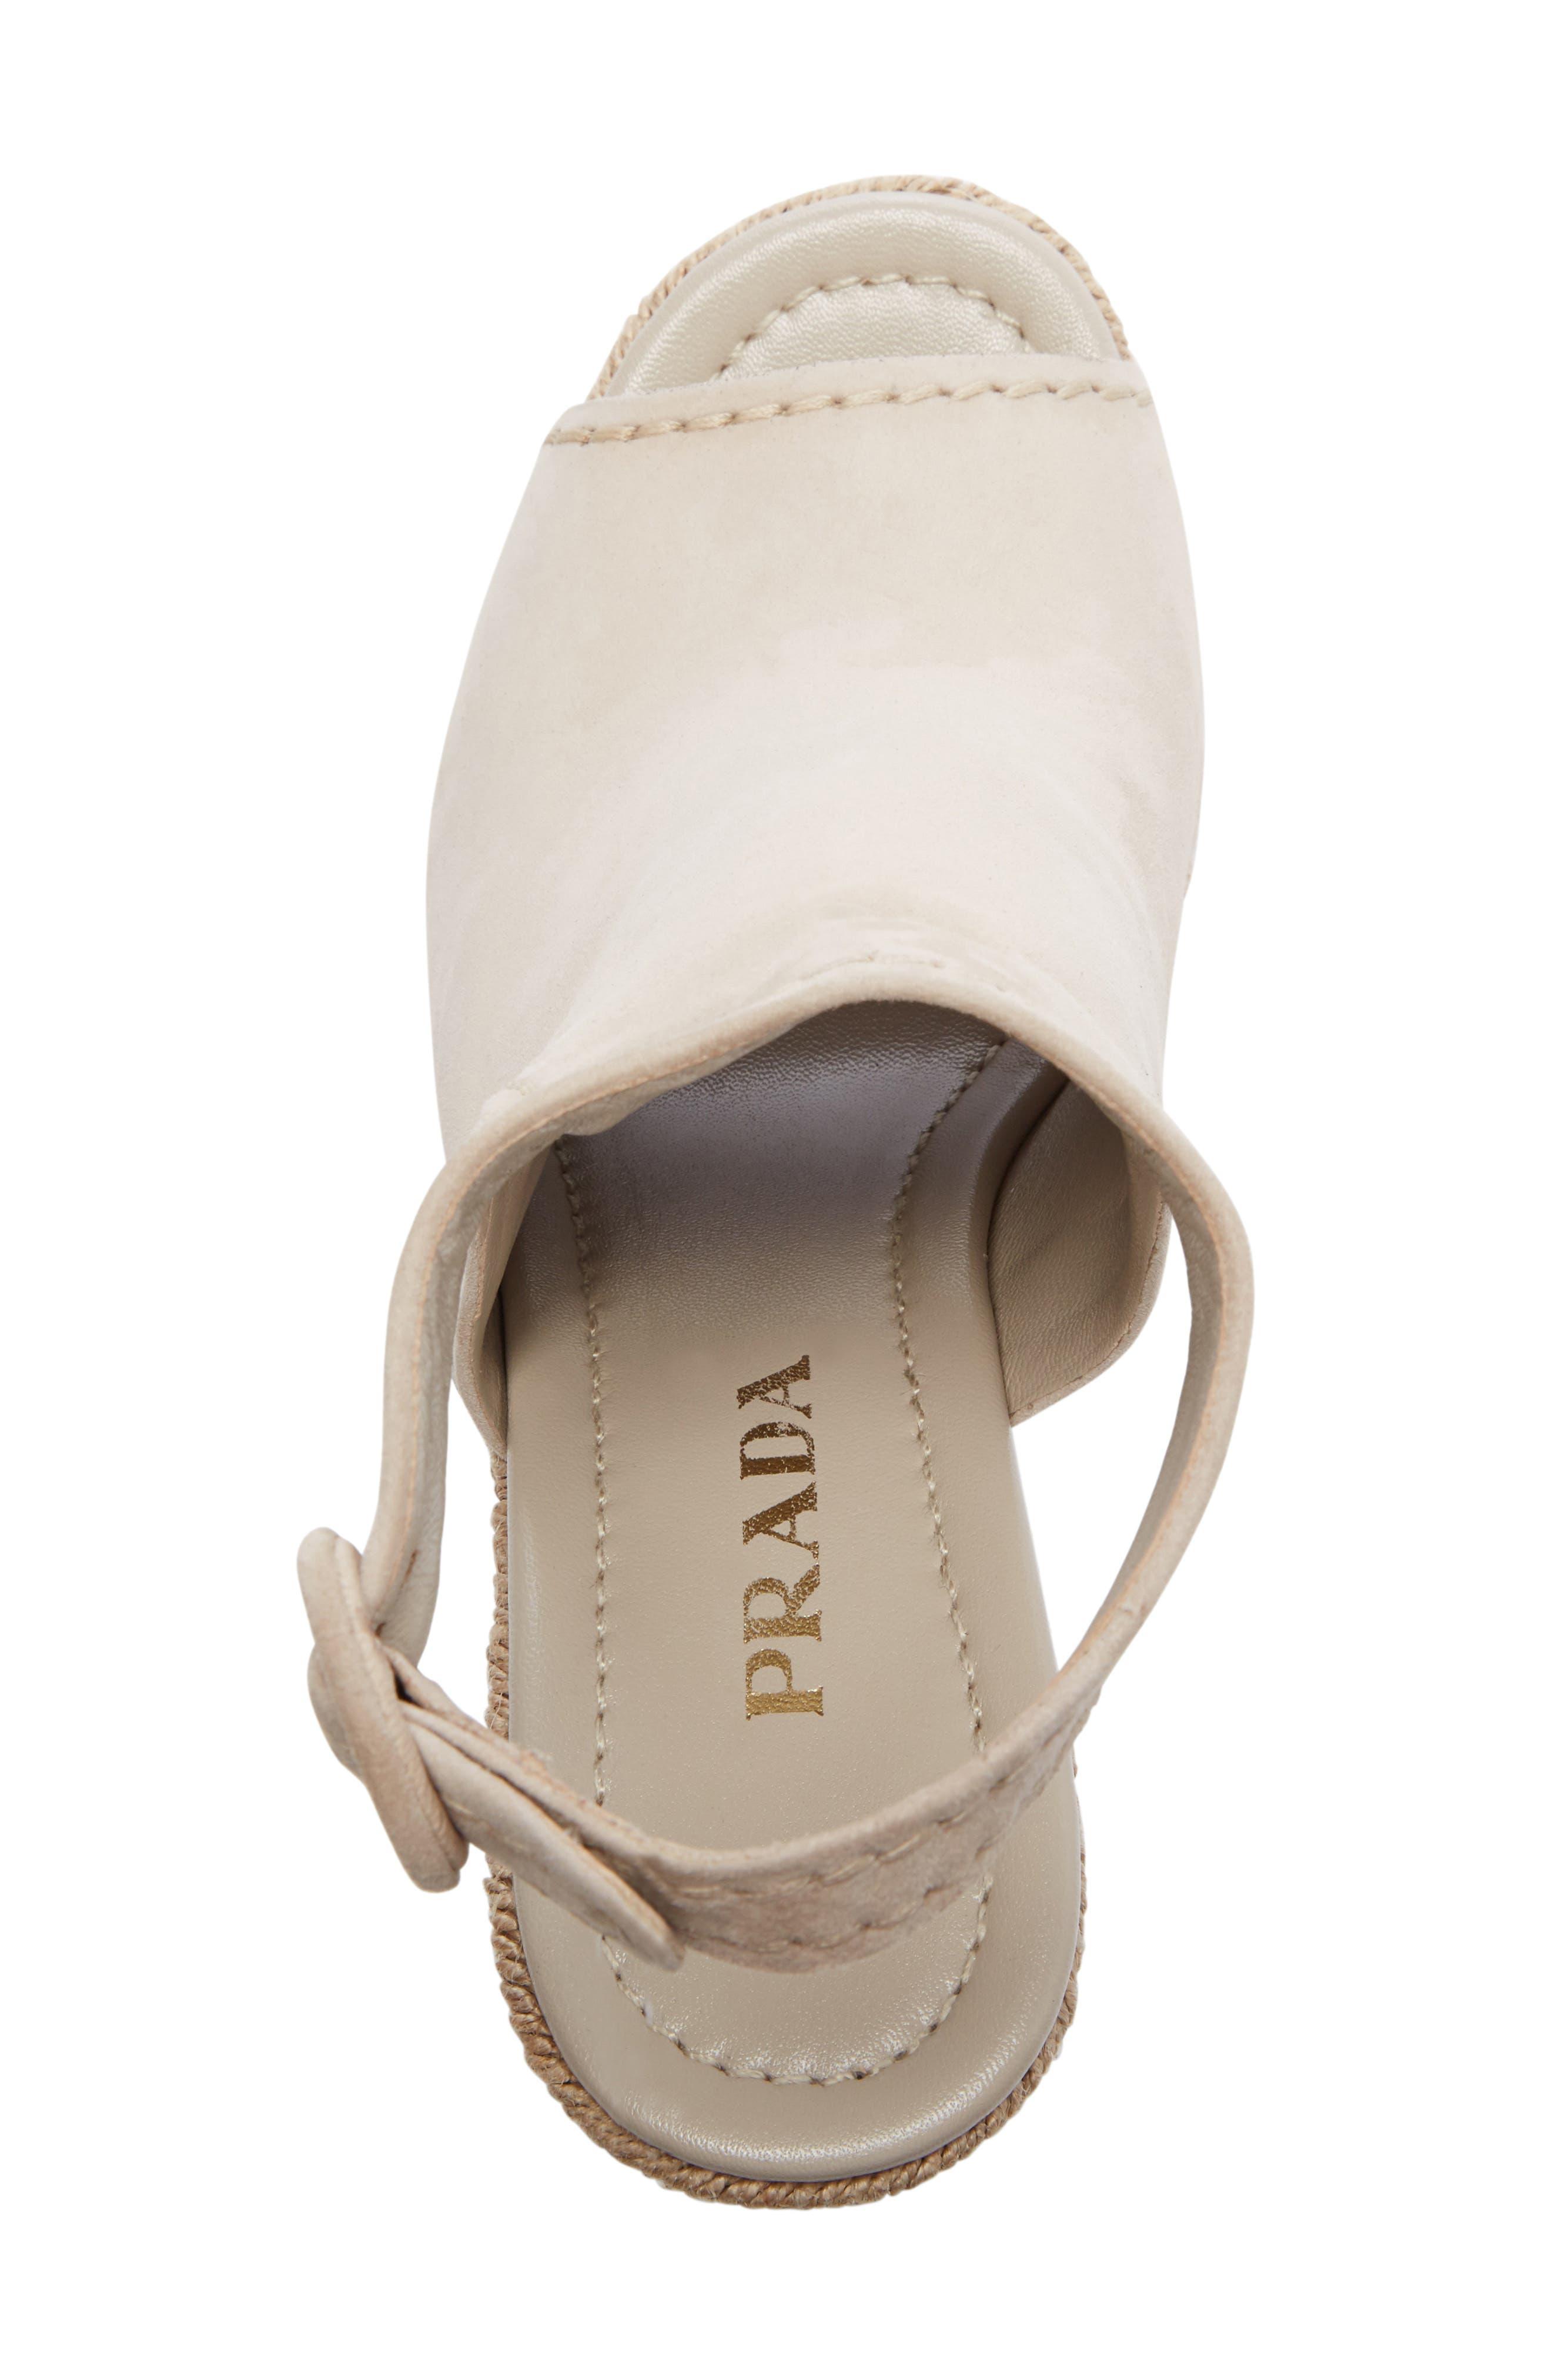 Ankle Strap Espadrille Wedge Sandal,                             Alternate thumbnail 3, color,                             Beige